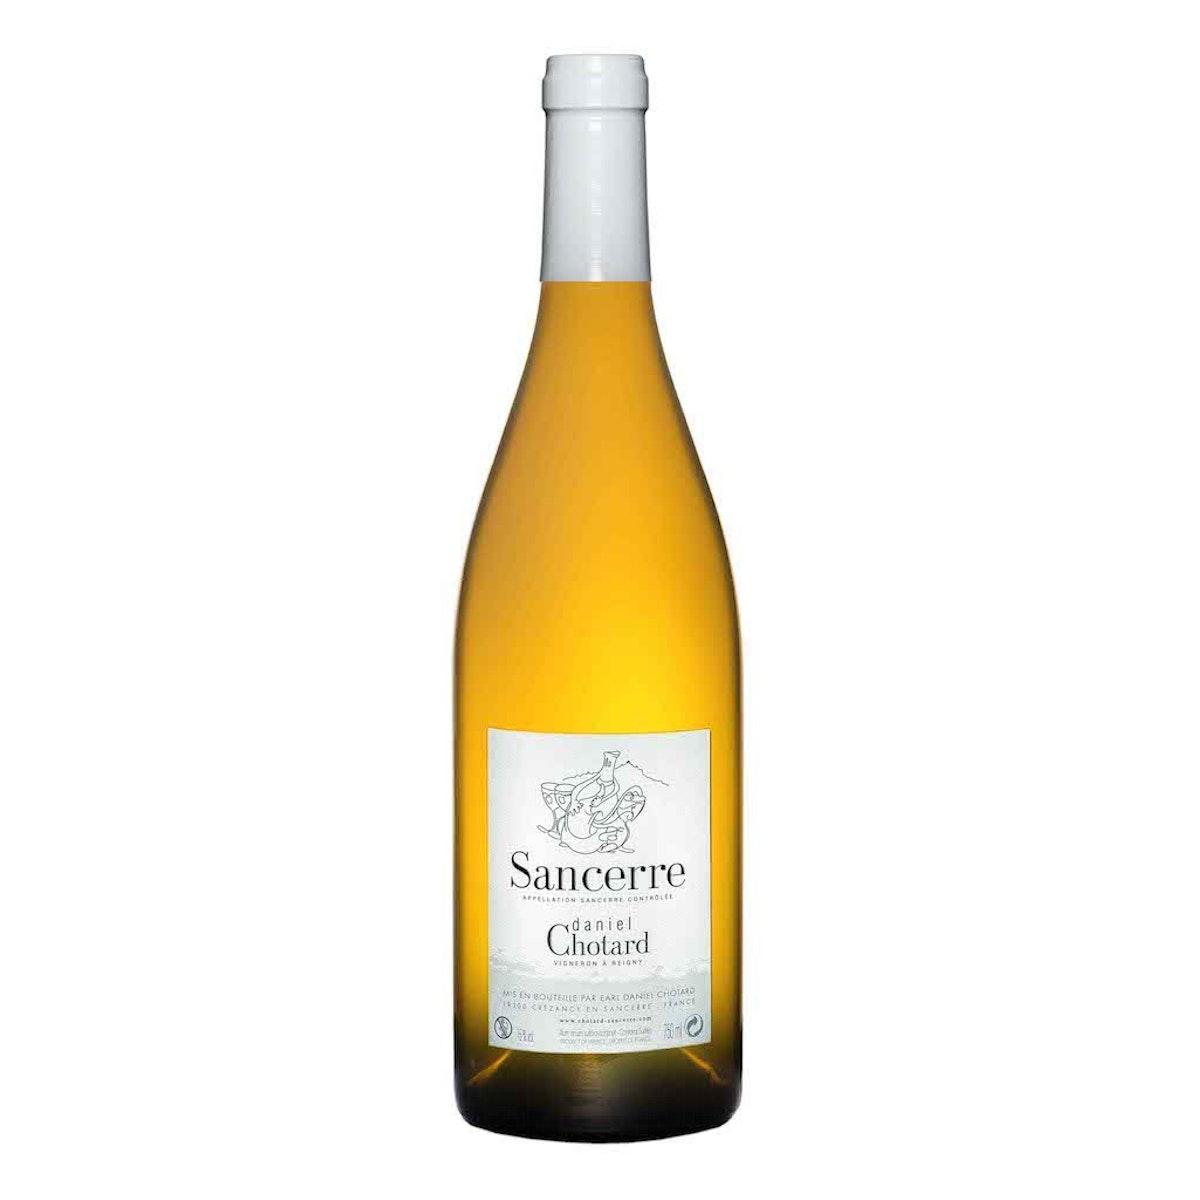 0.375L Sancerre Blanc, 2019